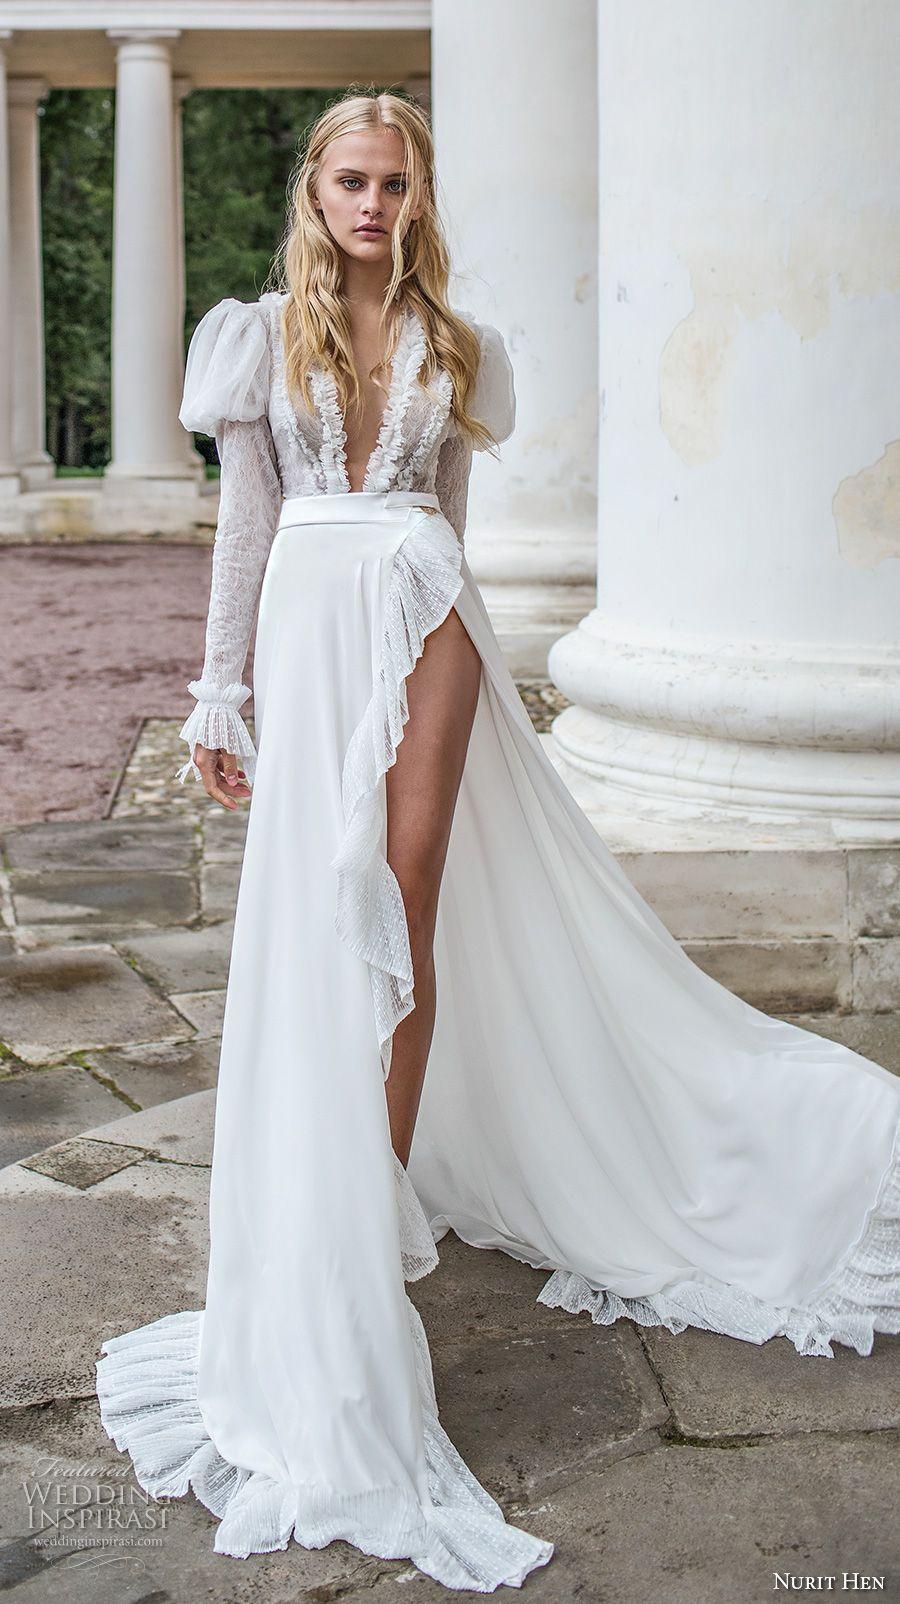 nurit hen 2017 bridal long puff sleeves deep plunging v neck sexy  unconventional flowy high slit a line wedding dress chapel dress (3) mv --  Nurit Hen Ivory ... cc8b8cbca